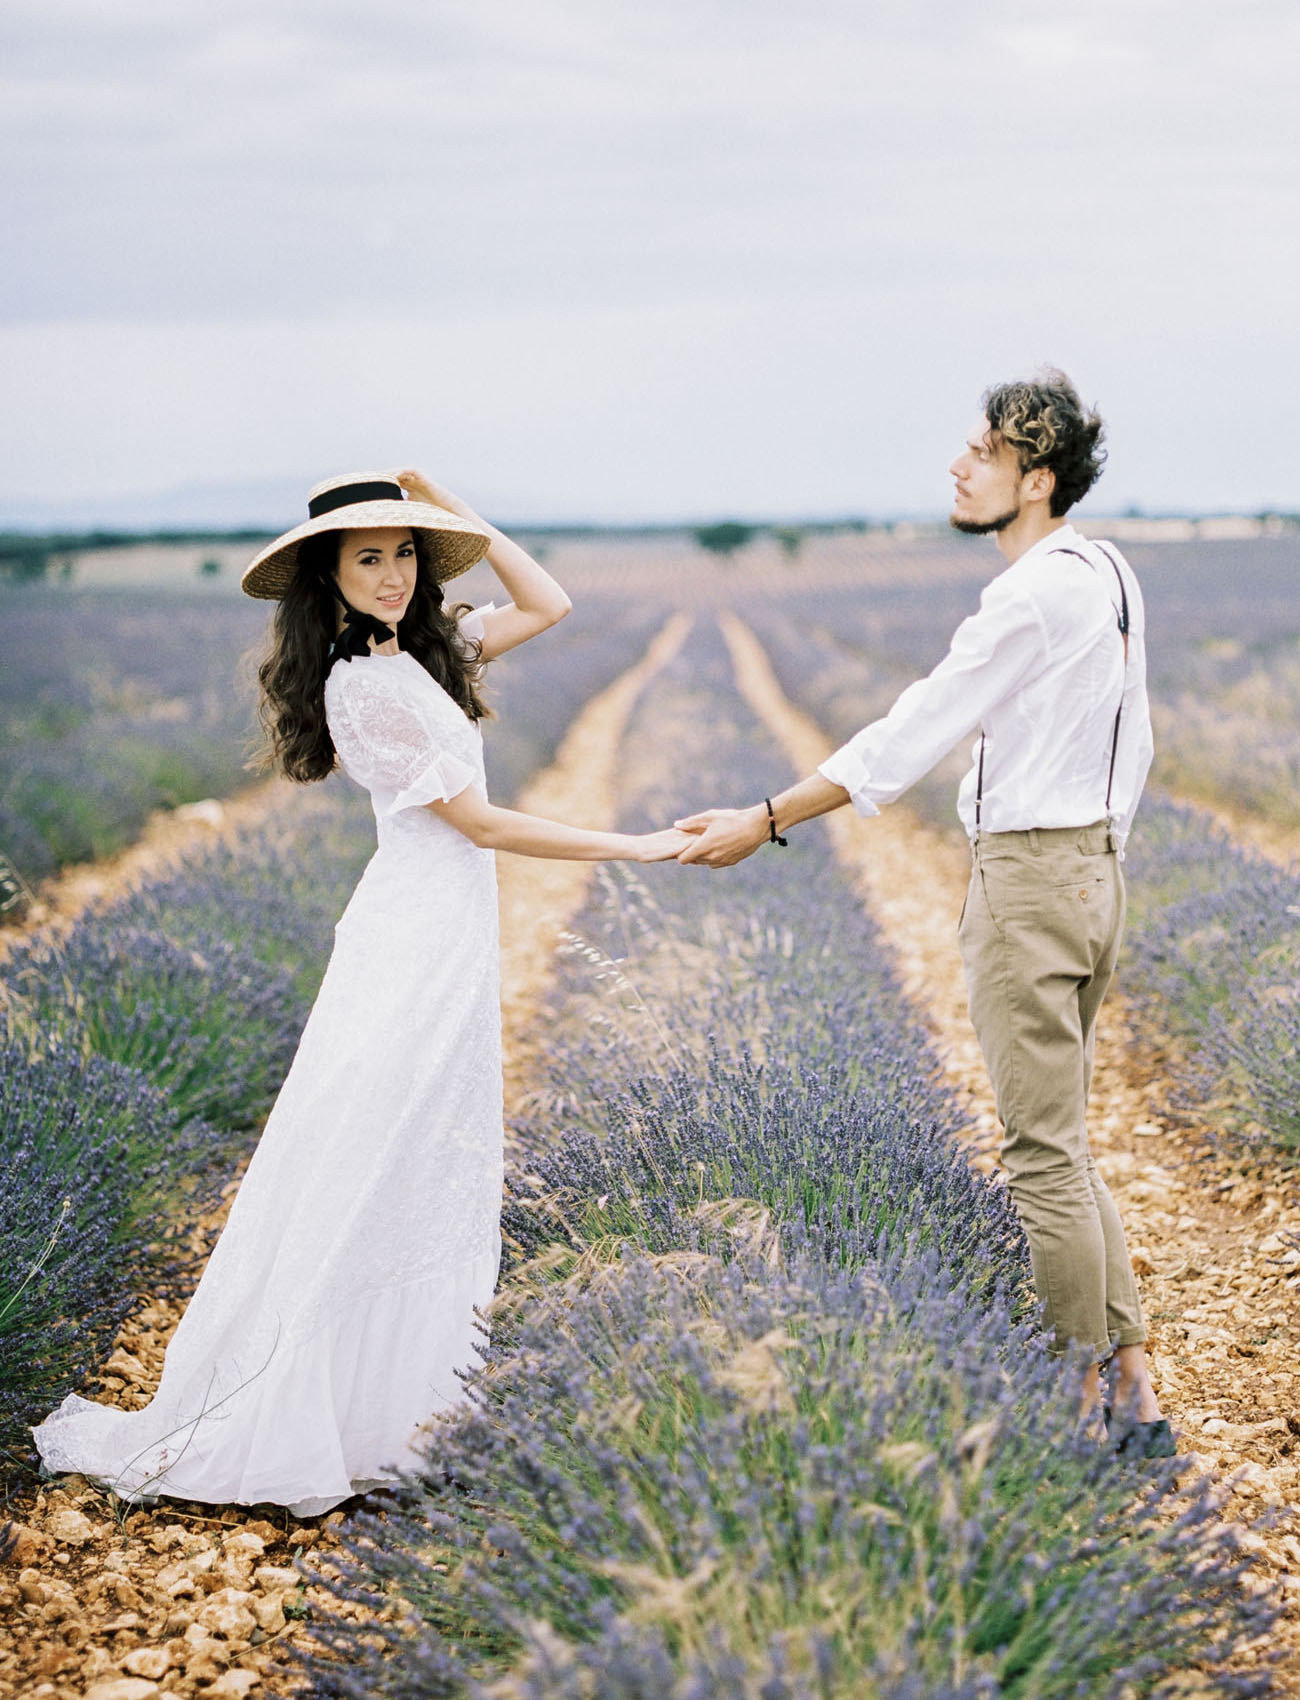 Spain Lavender Field Engagement